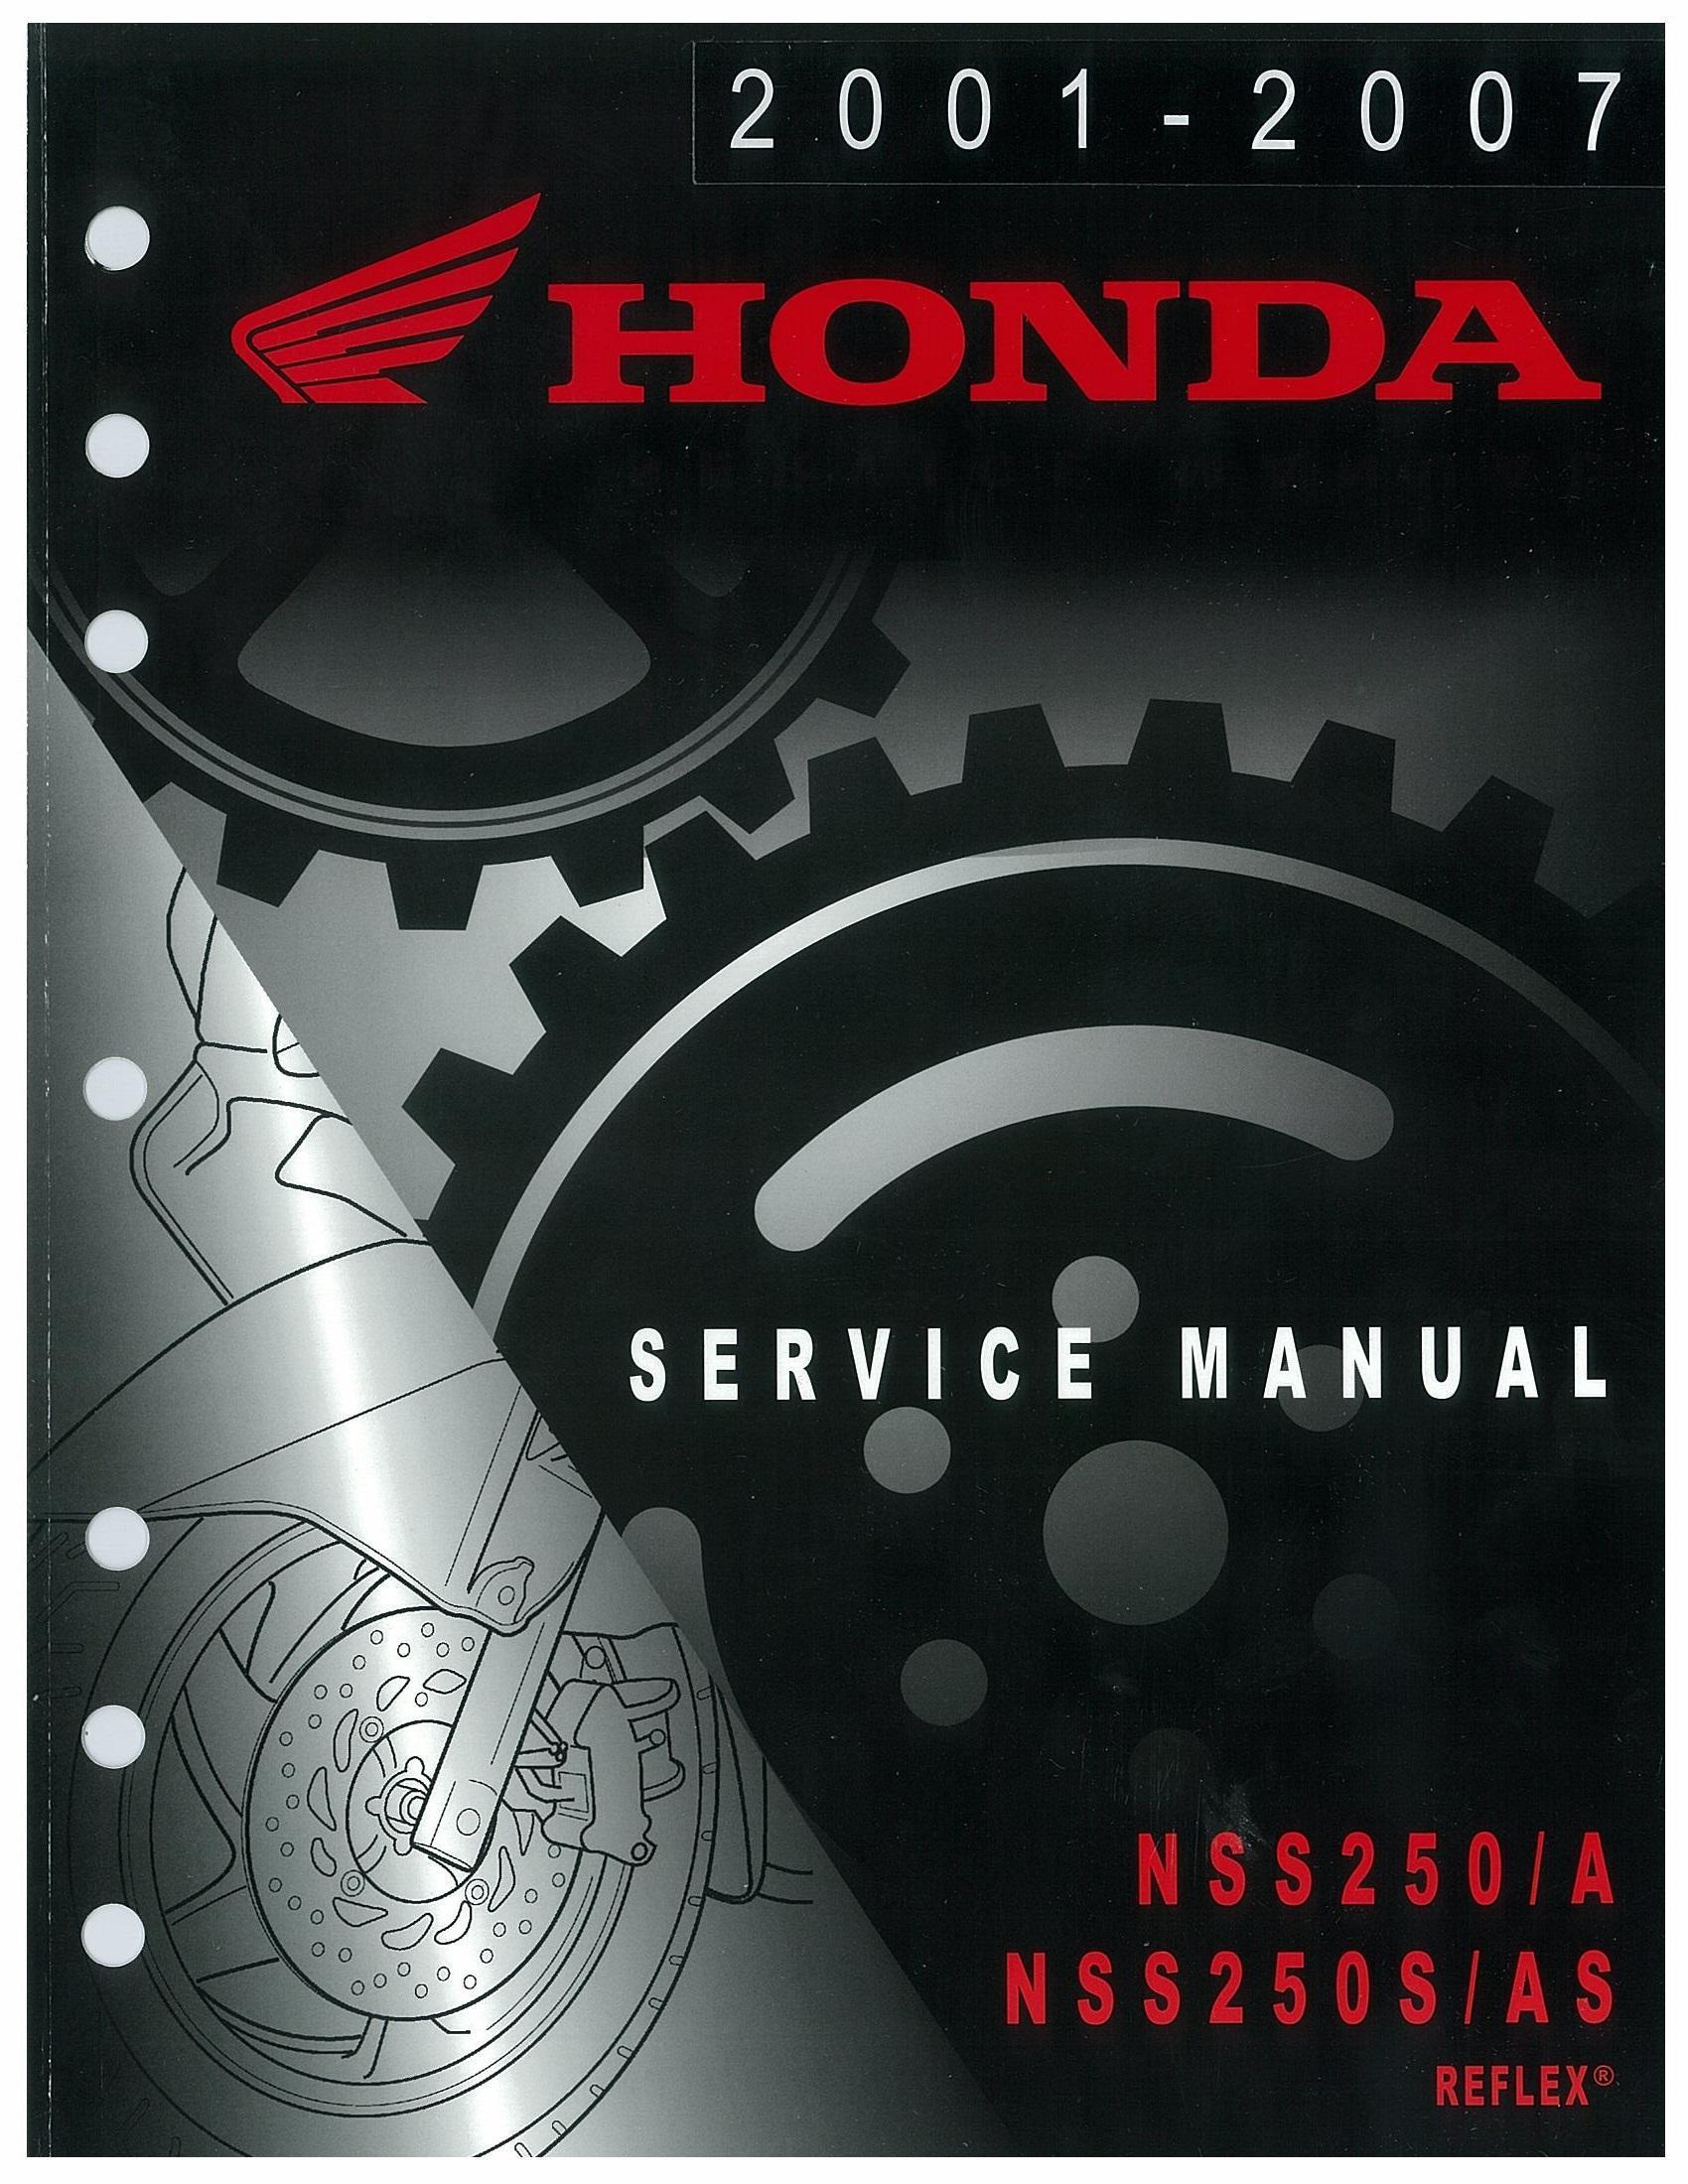 Workshop manual for Honda NSS250 (2001-2007)